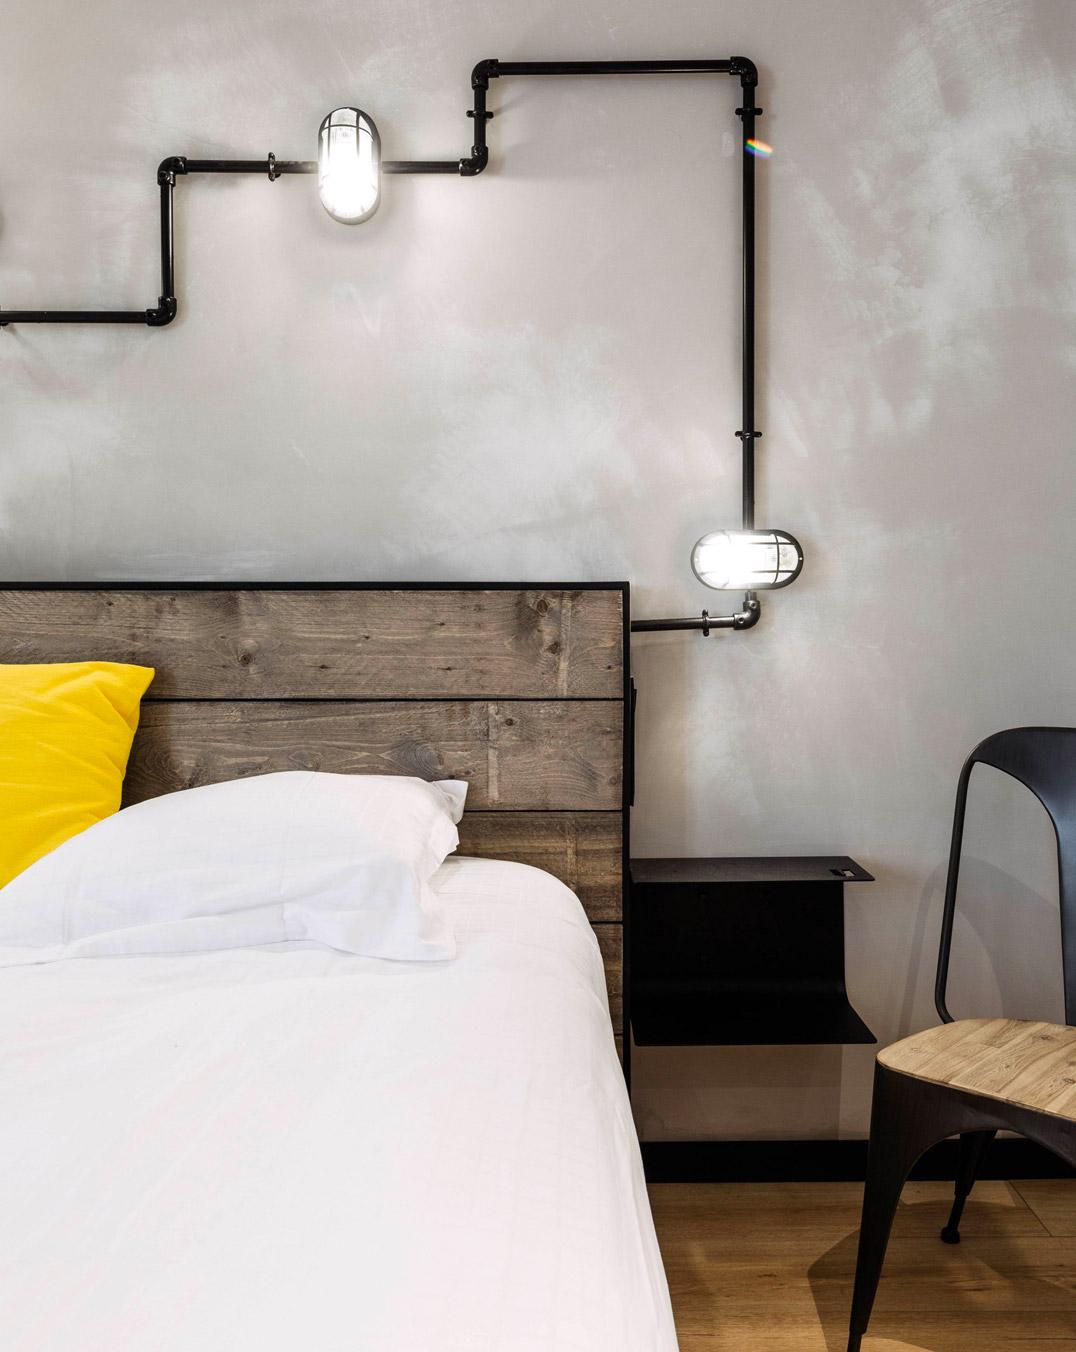 C Hotels - 1076x1352 - Body Image 2-2